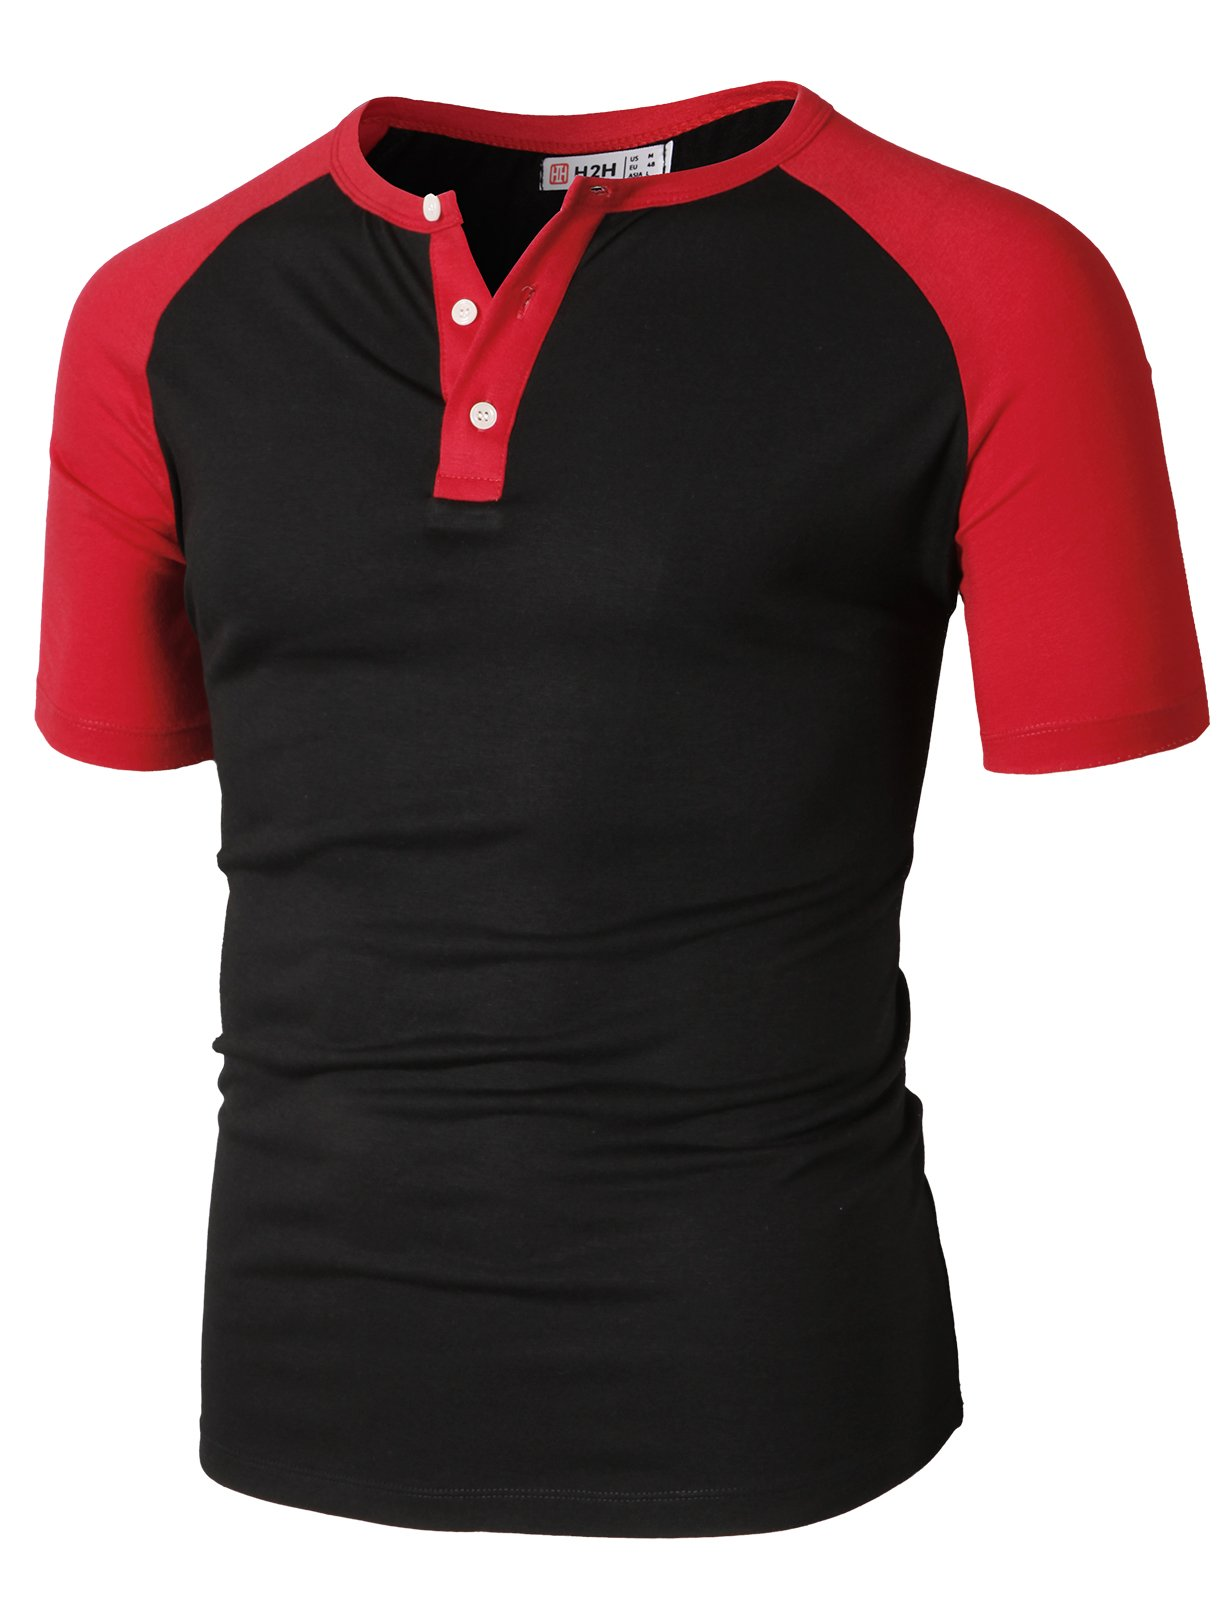 H2H Men Slim Fit Henley Raglan Short Sleeve Contrast Color Block Casual Baseball T-Shirt BlackRed US L/Asia XL (CMTTS0222)